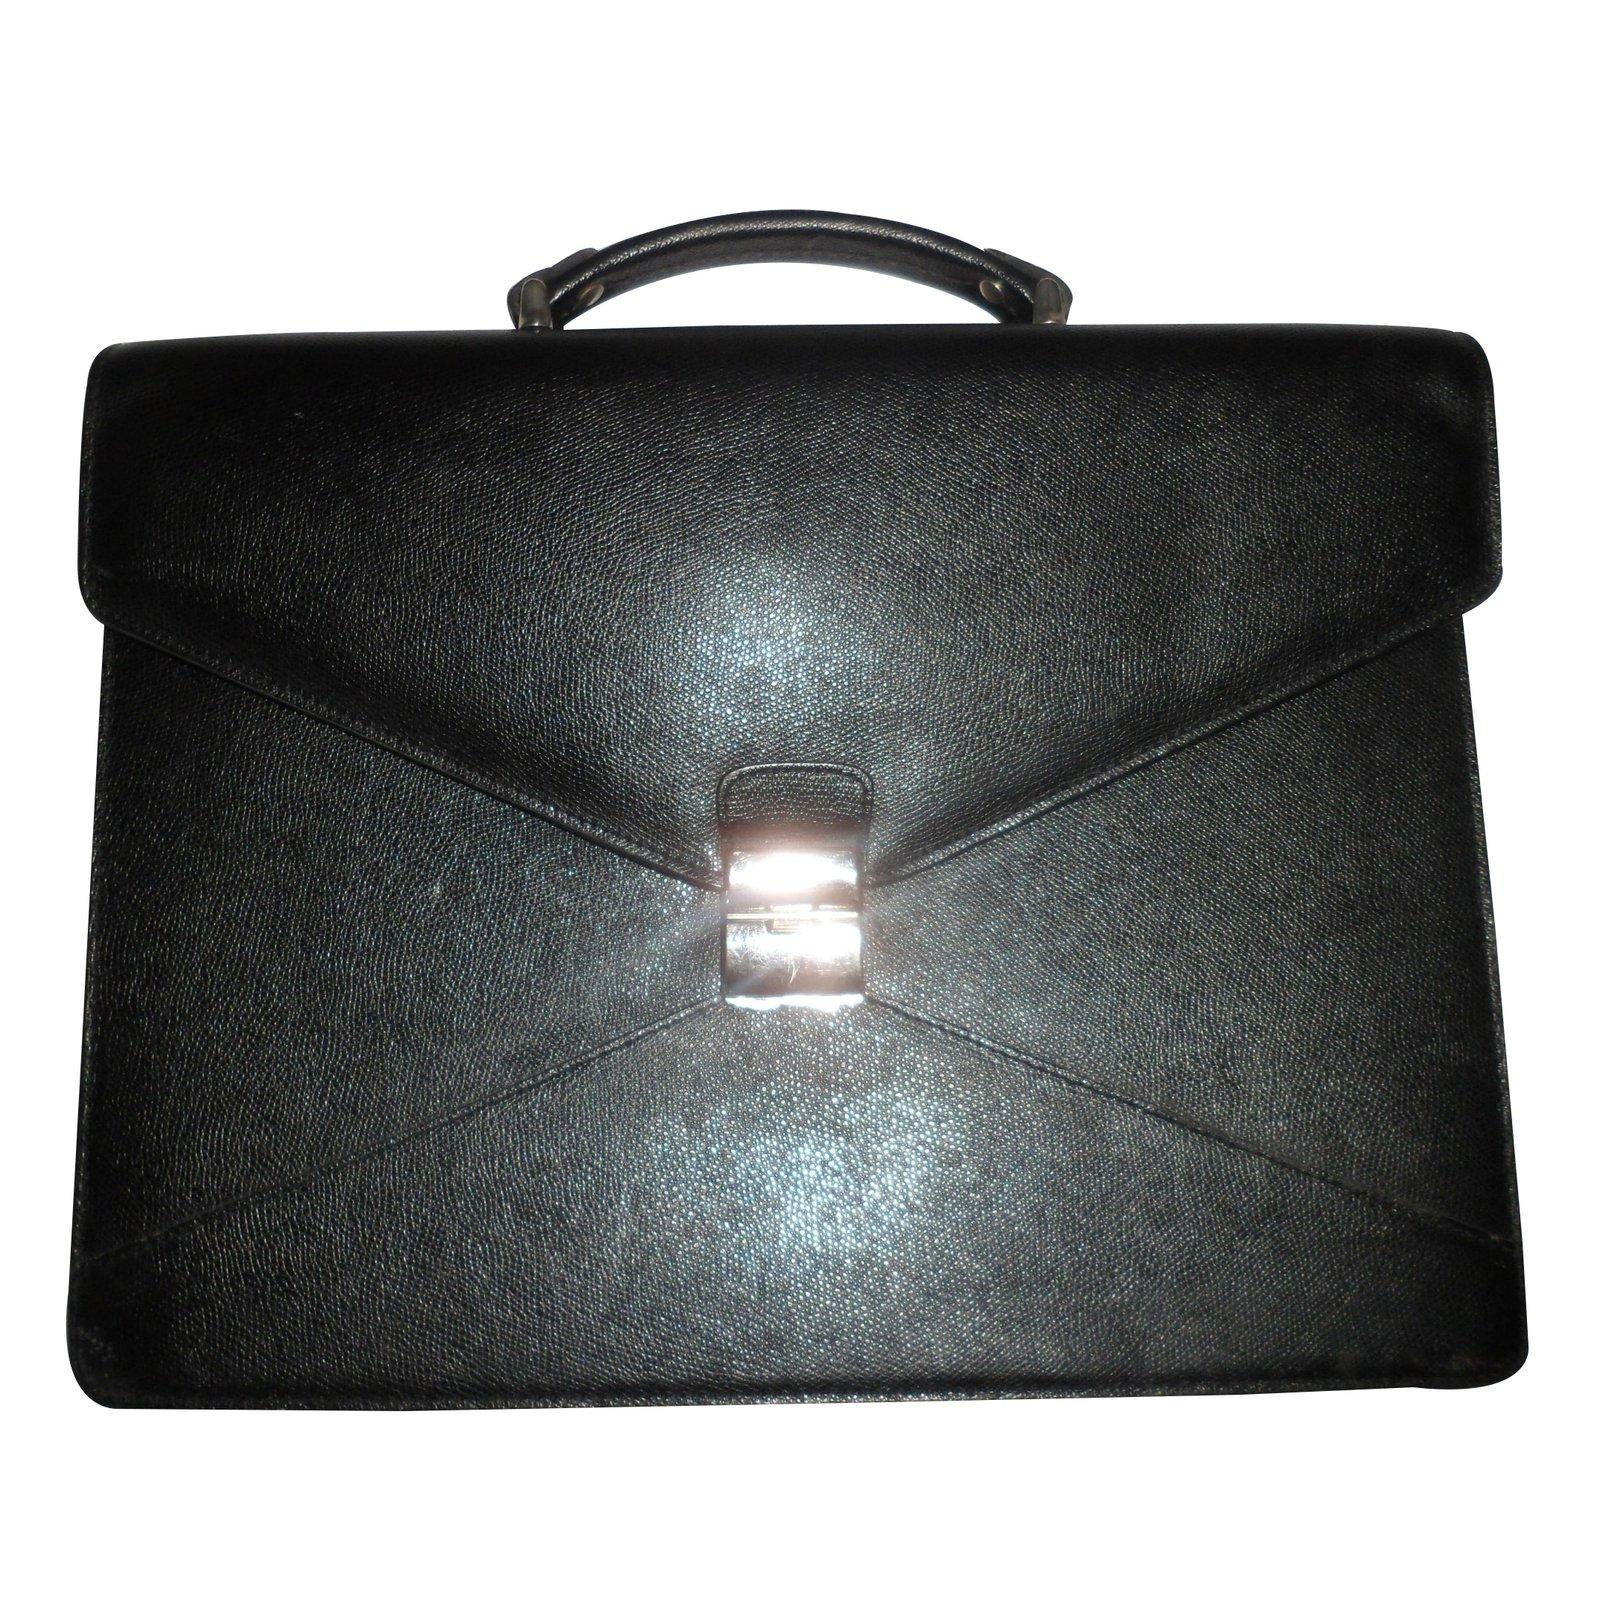 sacs lancel serviette porte document cuir noir joli closet. Black Bedroom Furniture Sets. Home Design Ideas